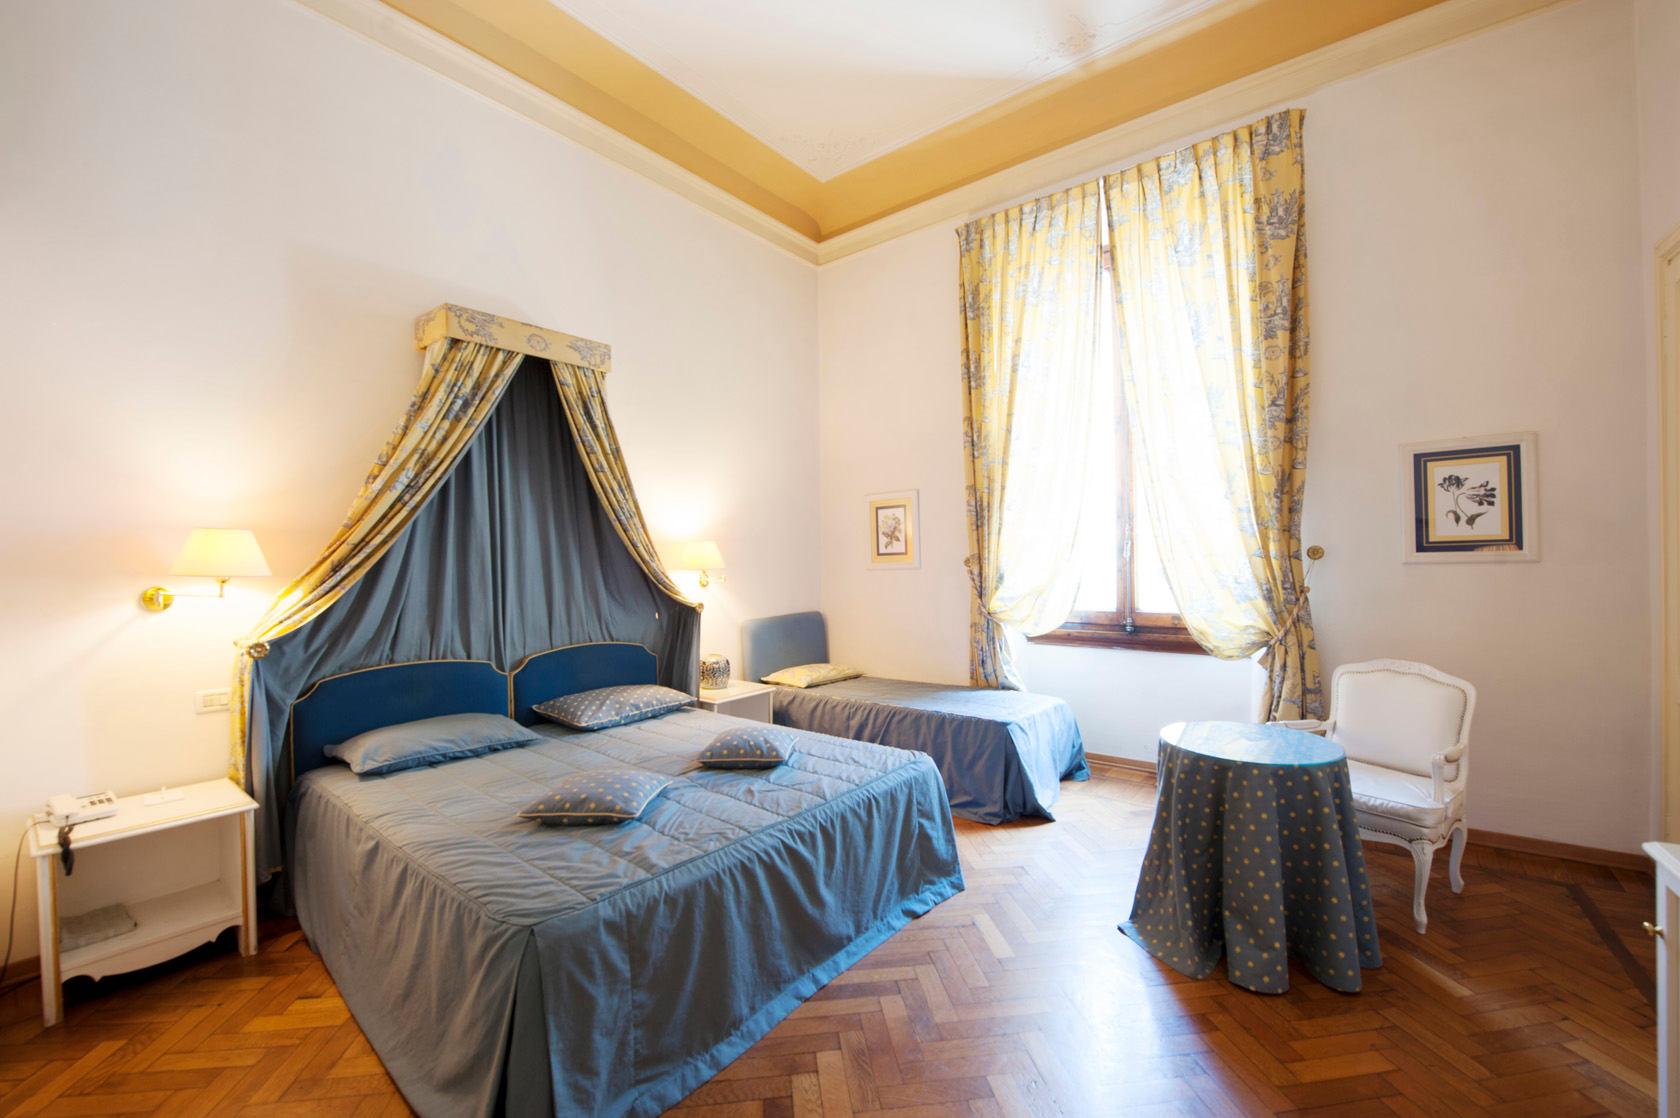 Bed and Breakfast Firenze Centro Storico Vista Duomo